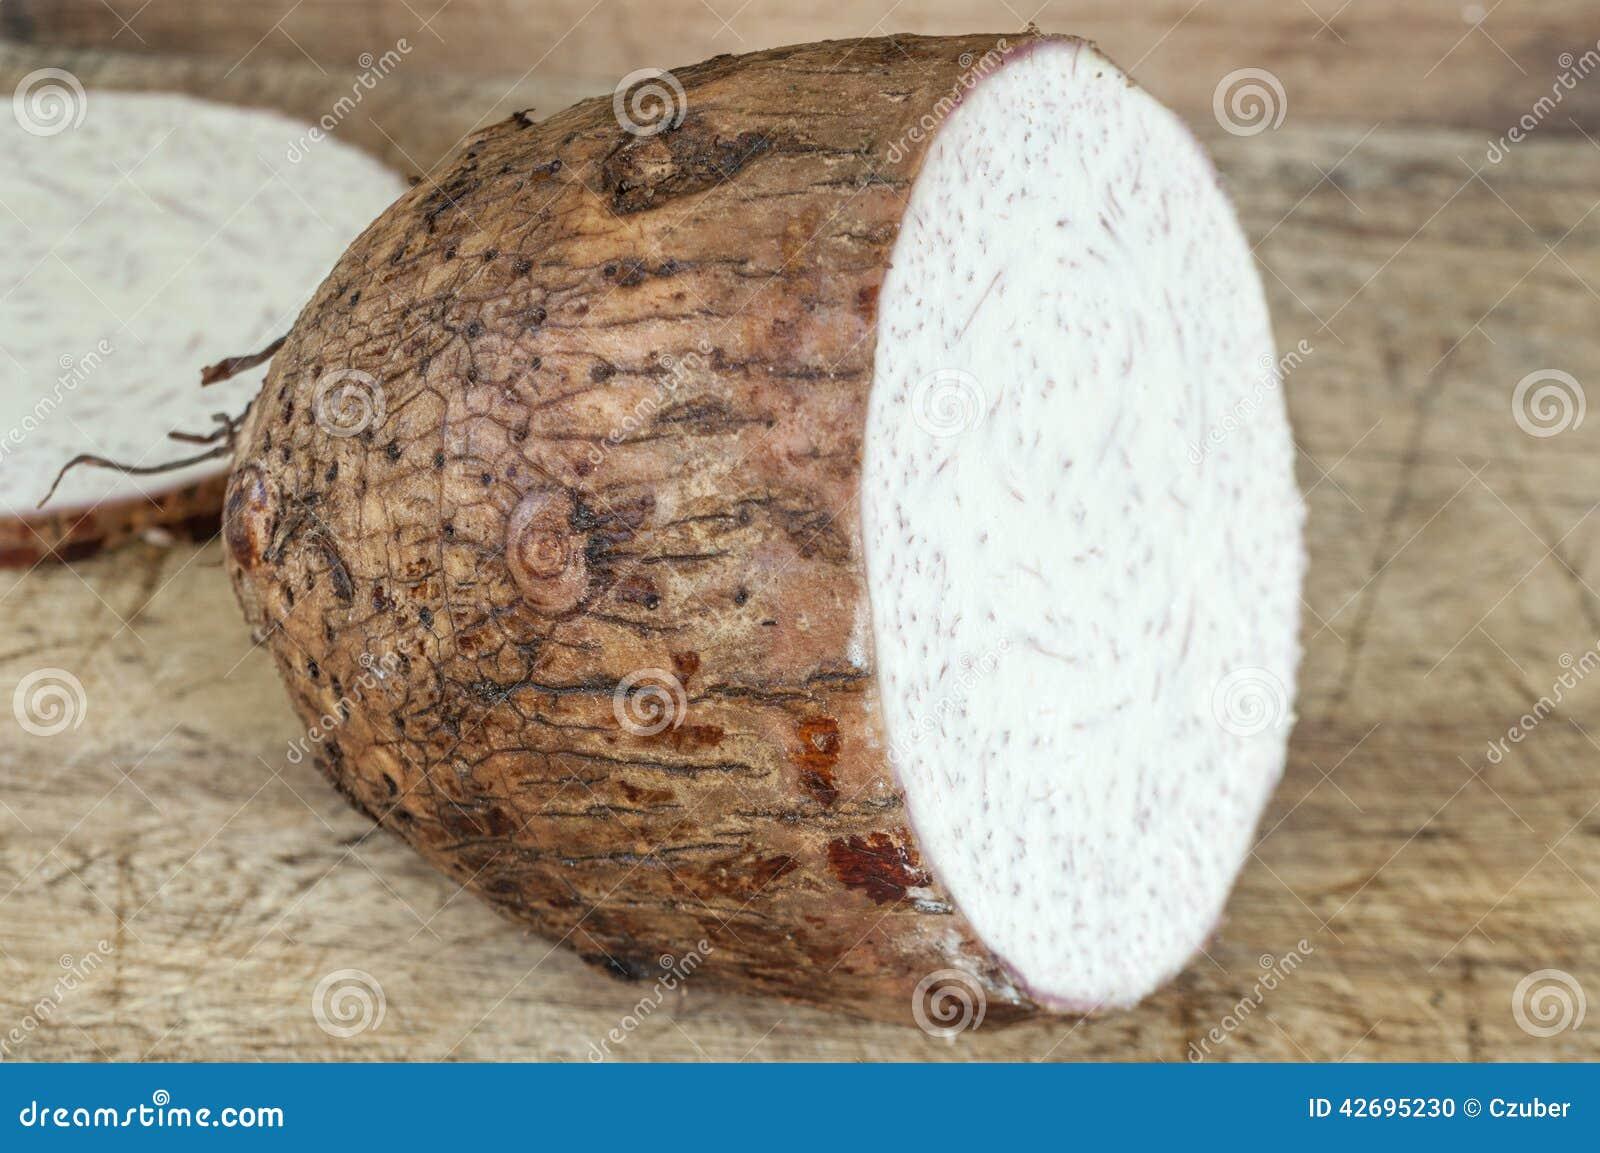 Name Root: Sliced Malanga Root Stock Photo